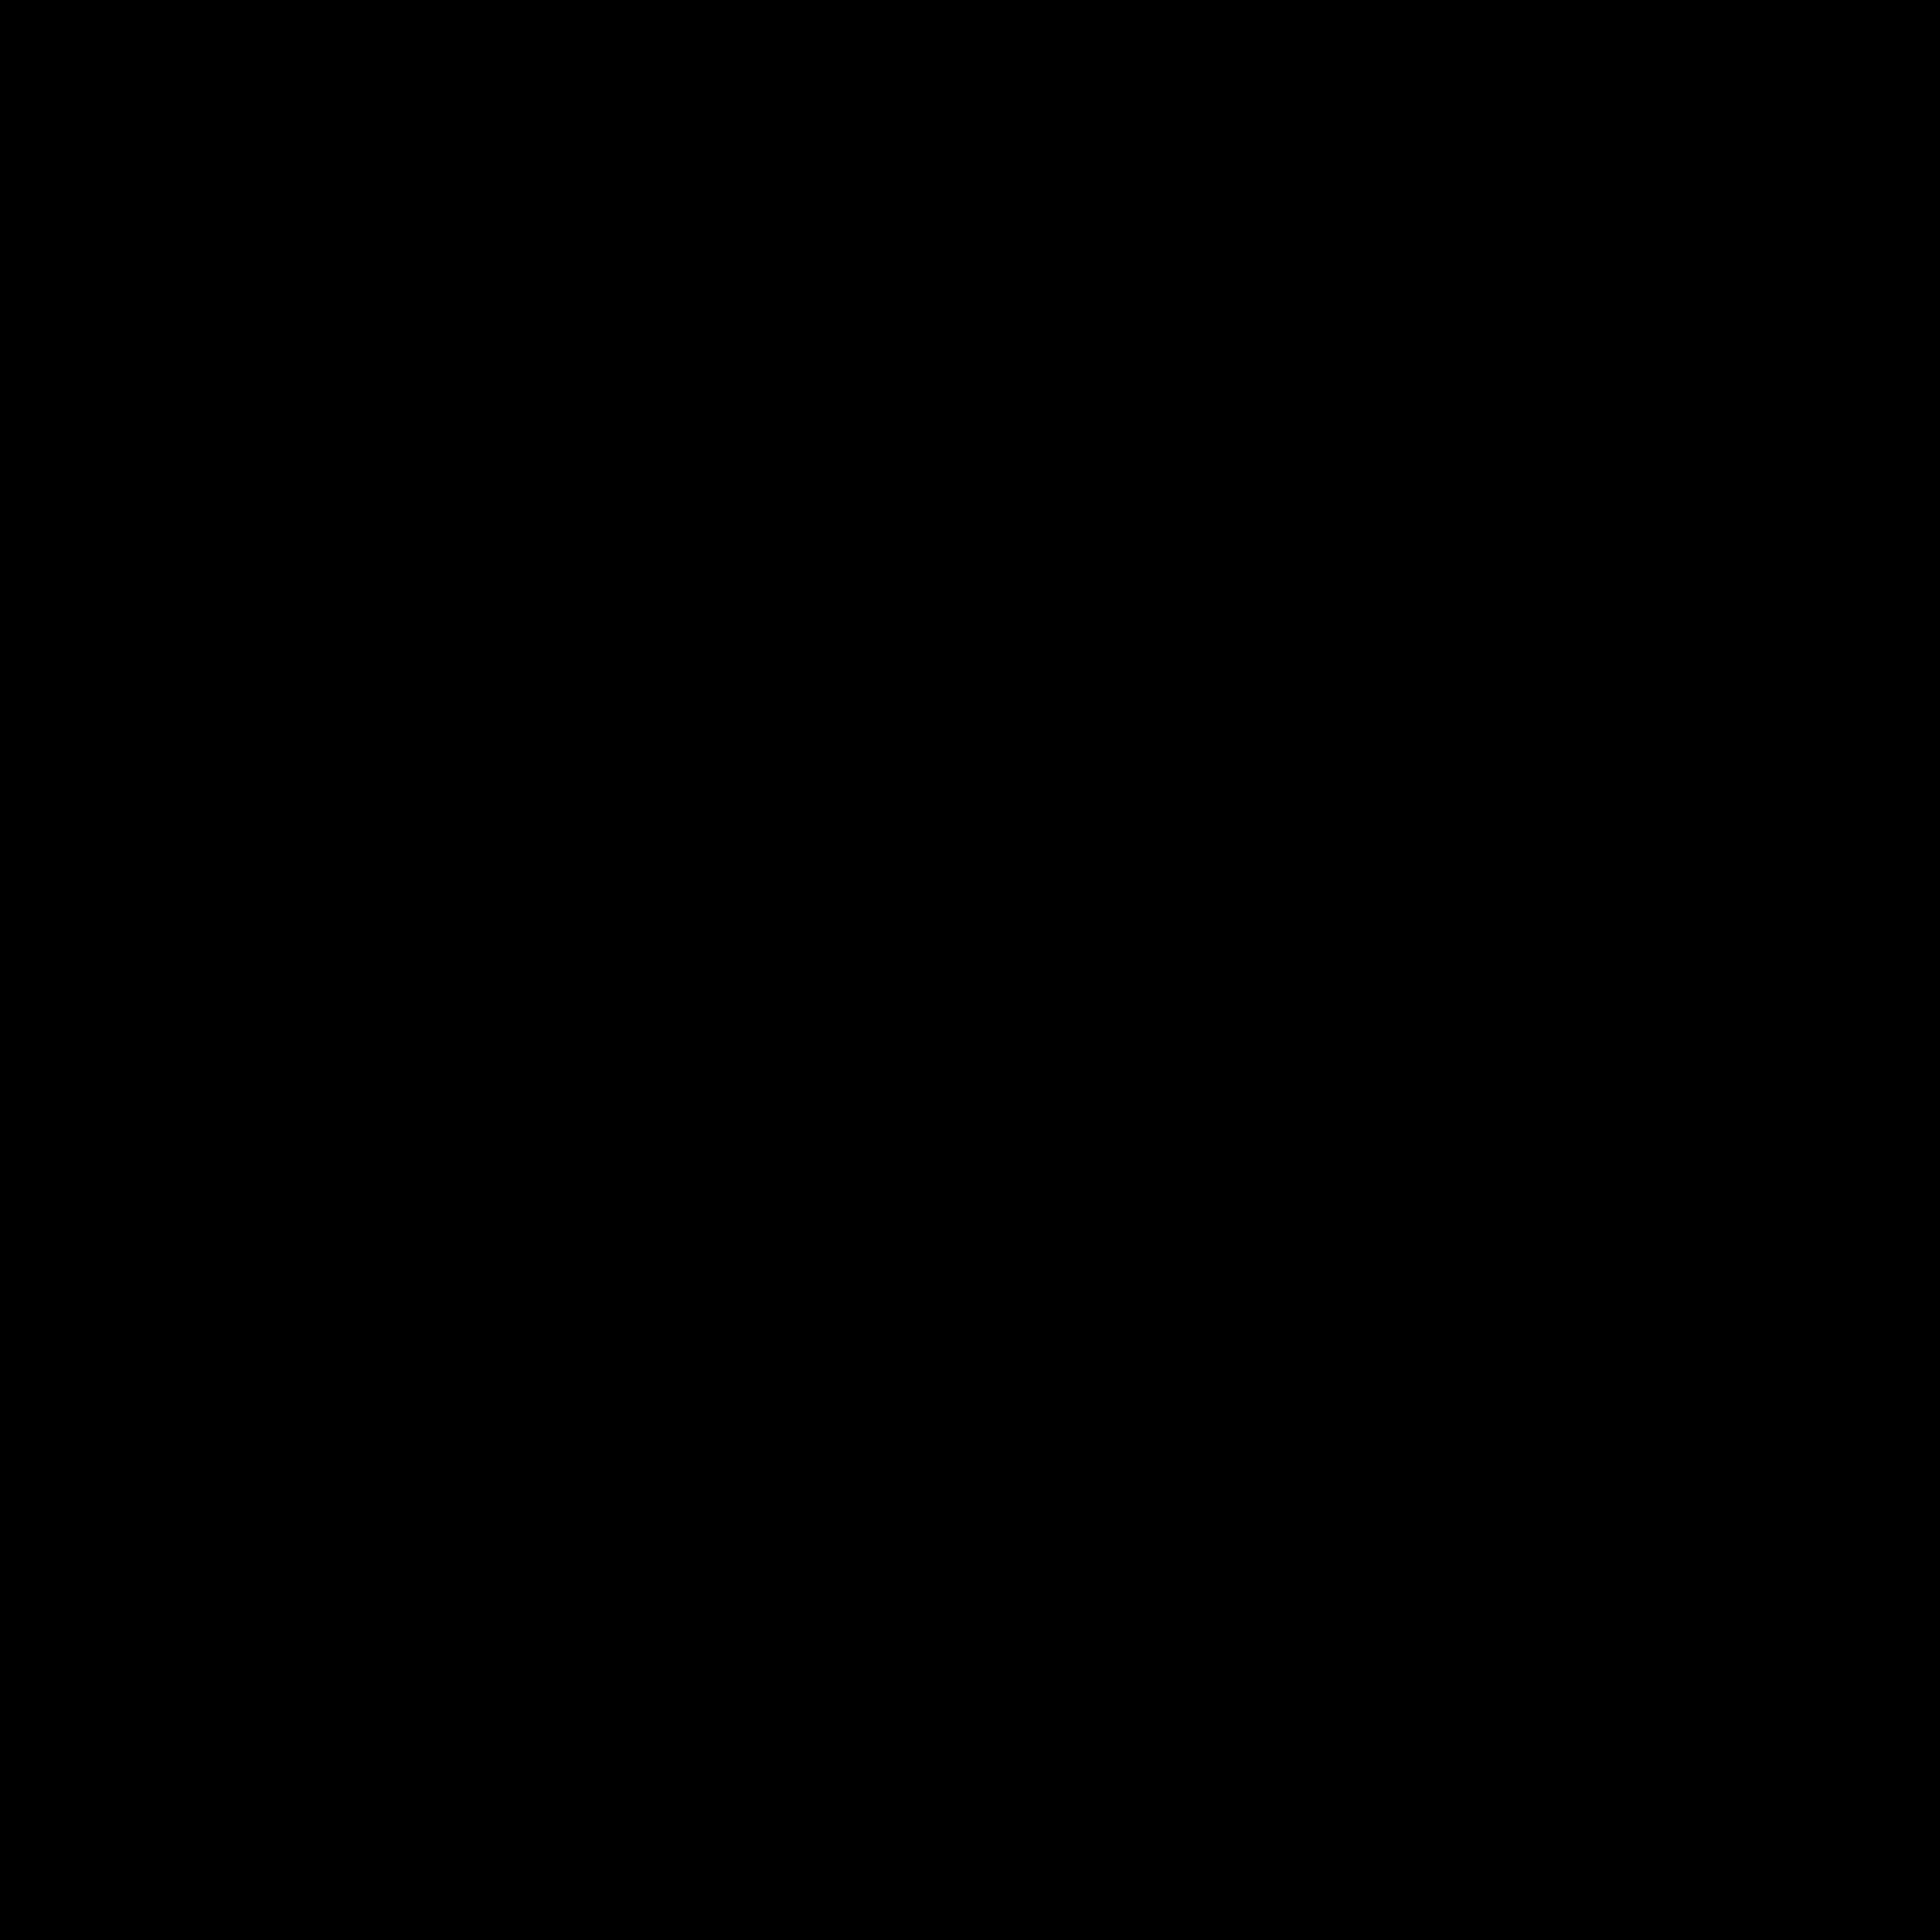 logo_sigil_1ac.png